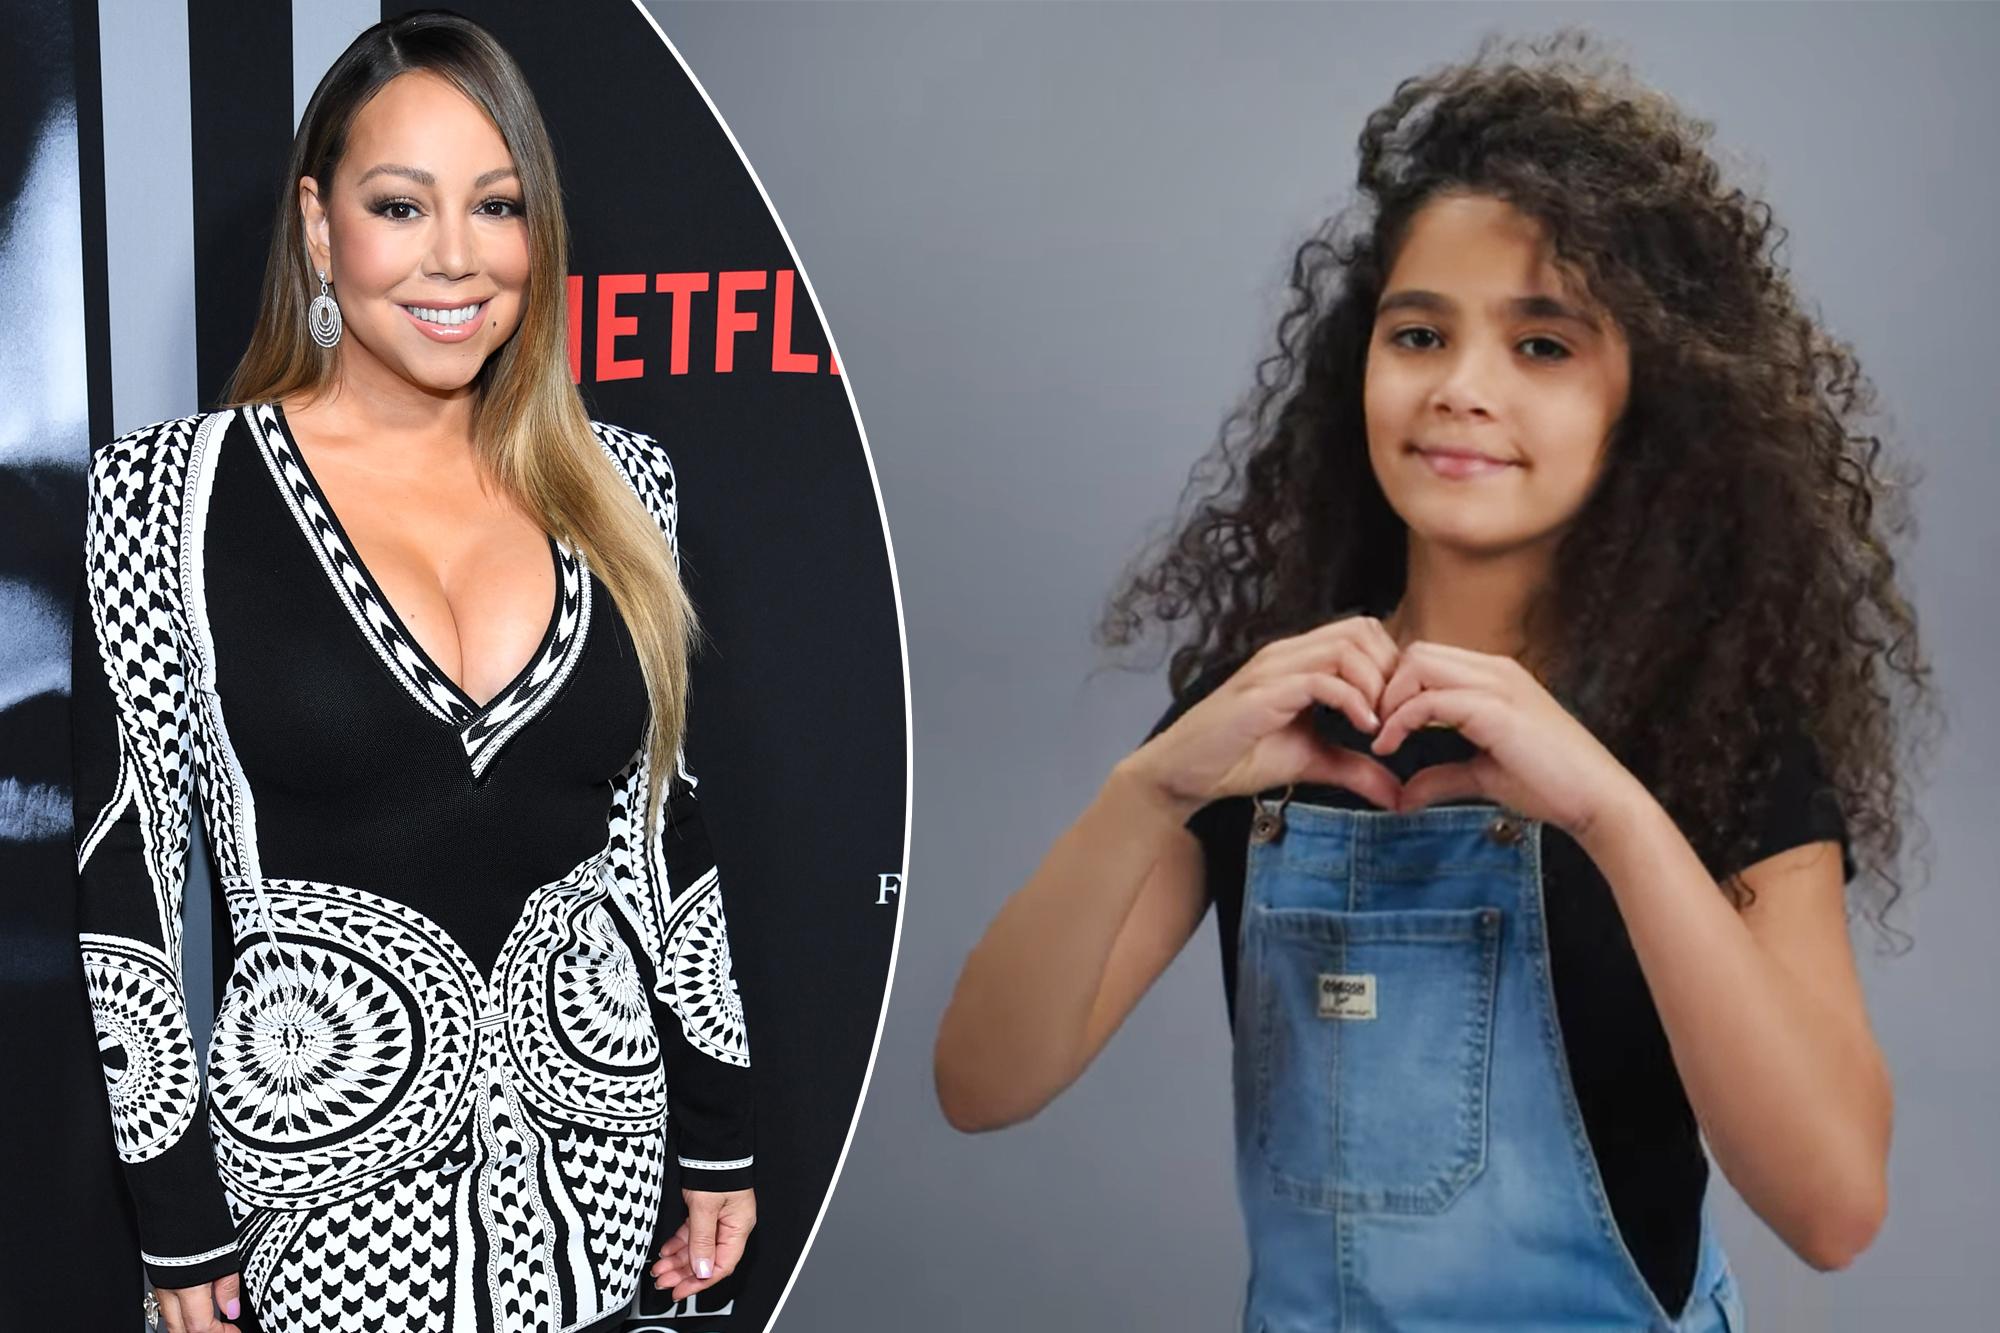 Mariah Carey's daughter Monroe, 20, makes modeling debut